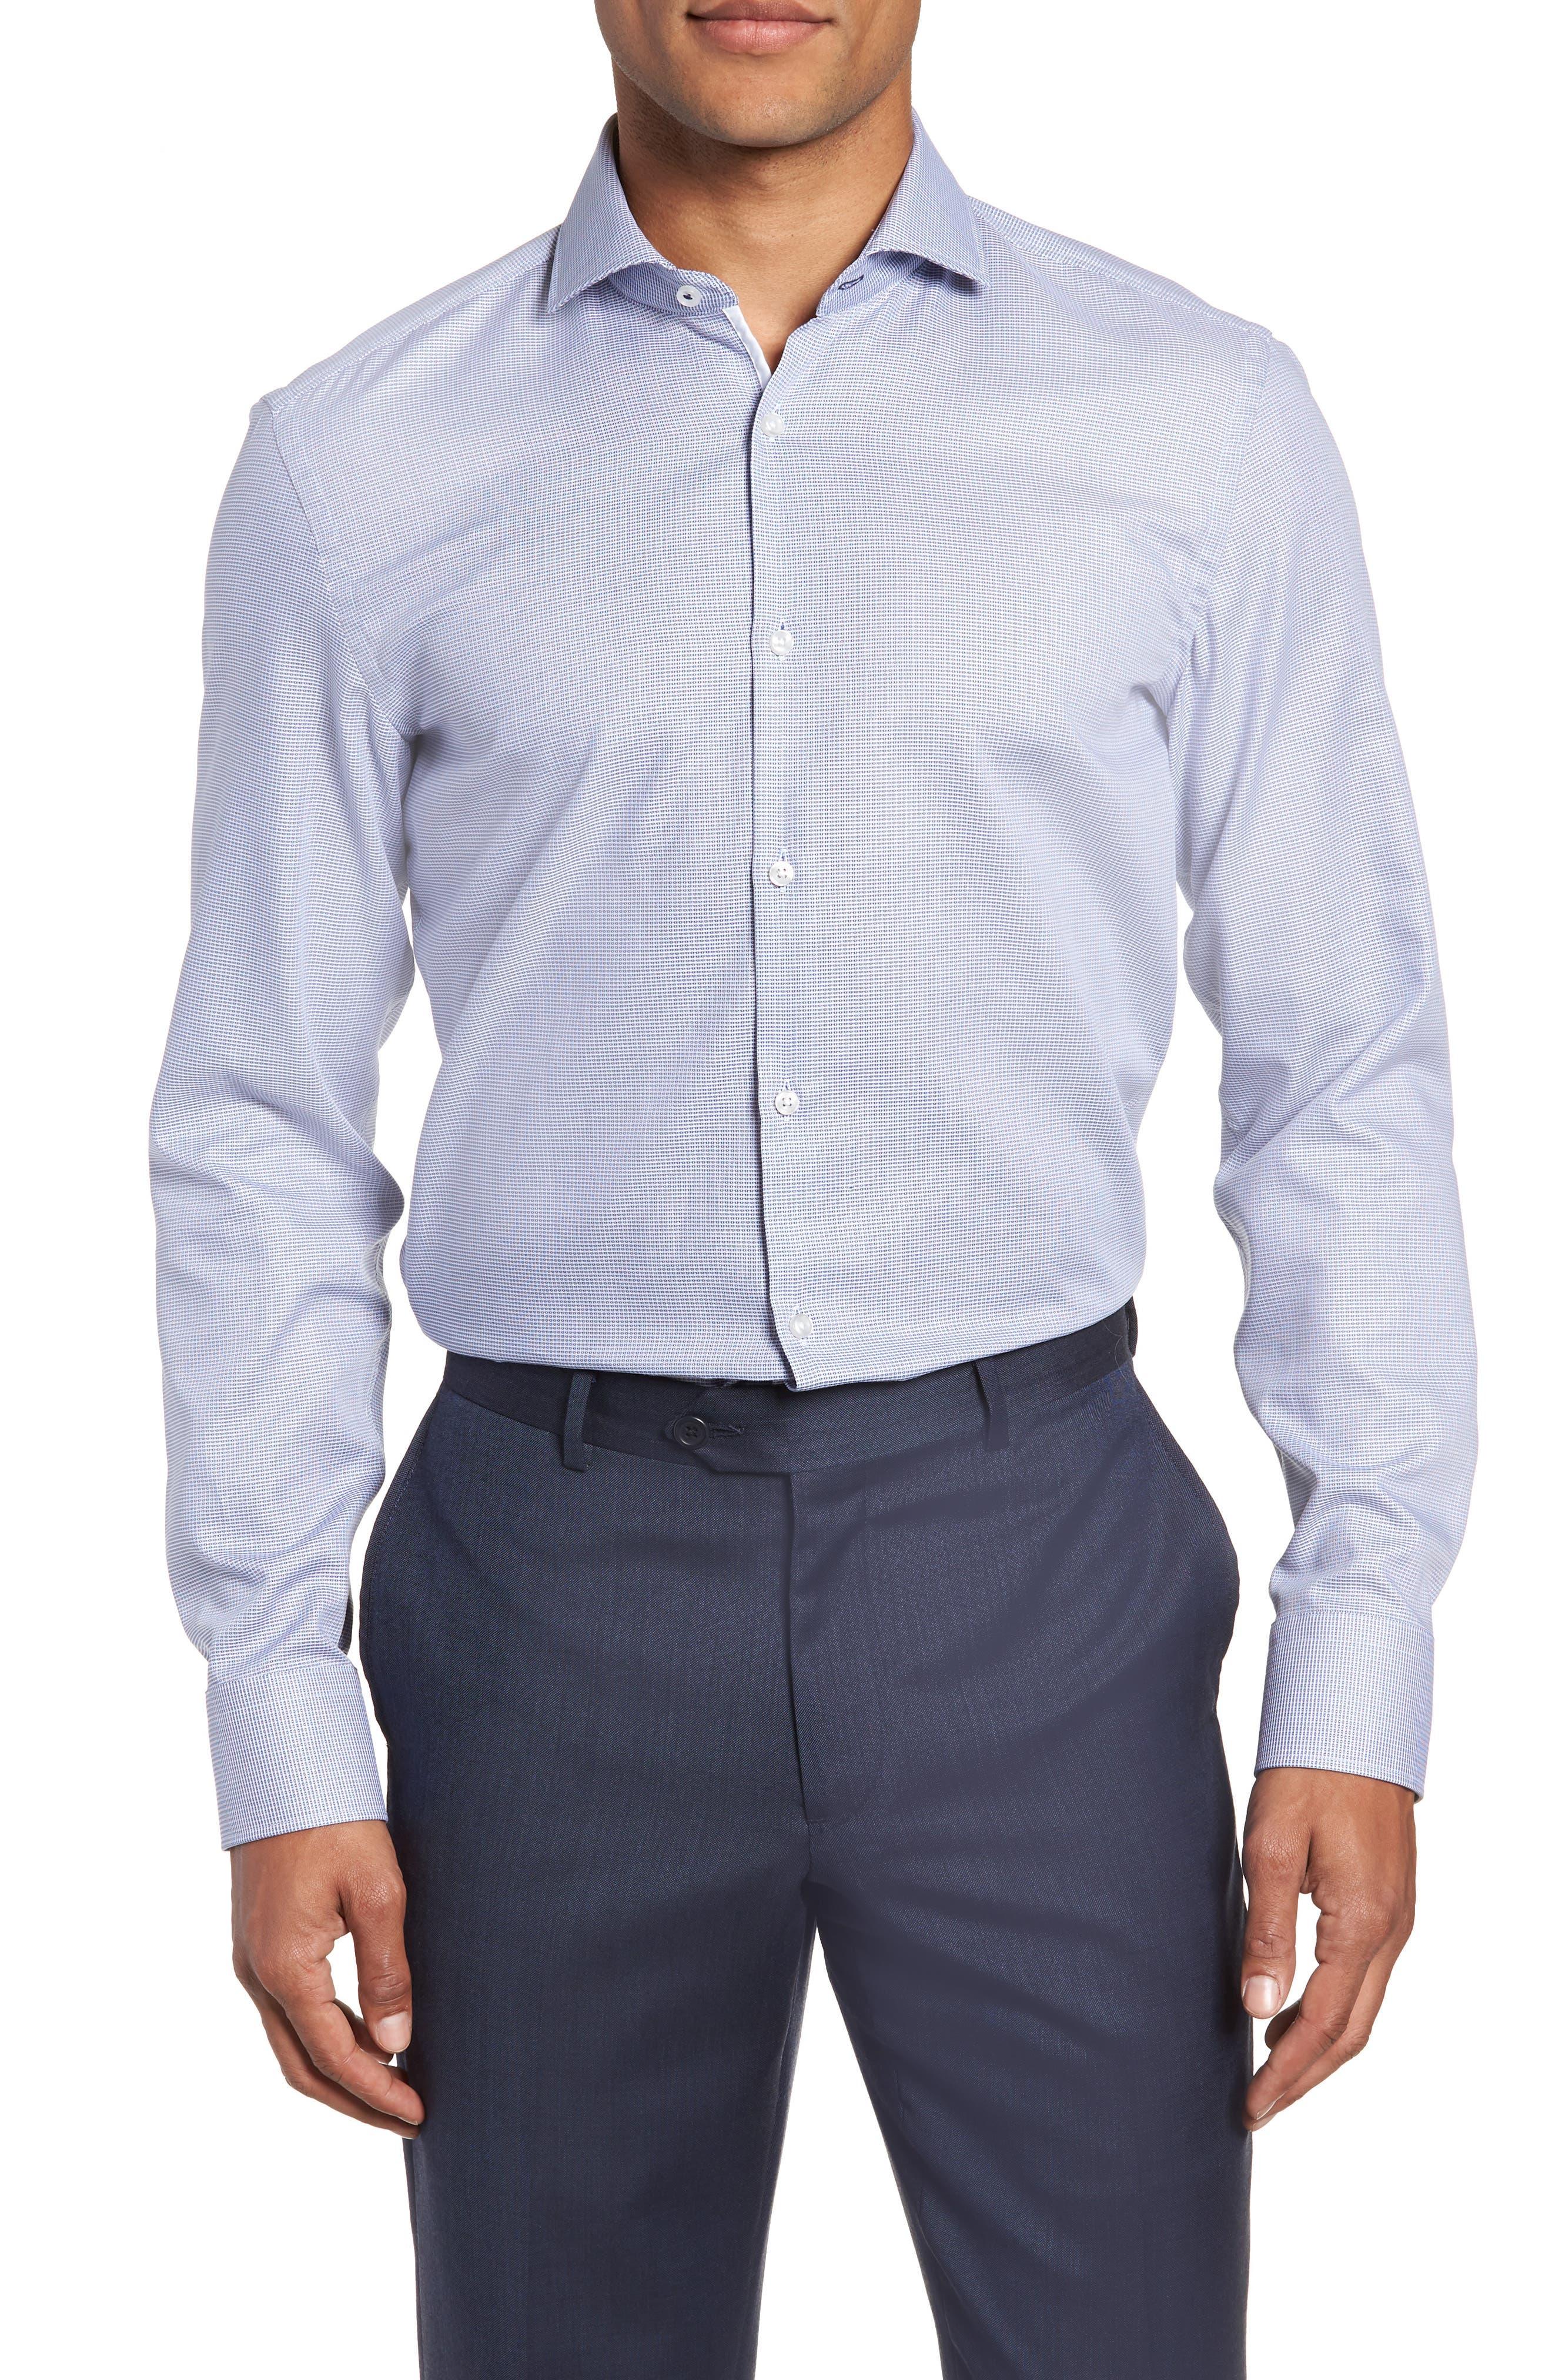 x Nordstrom Jerrin Slim Fit Solid Dress Shirt,                             Main thumbnail 1, color,                             BLUE